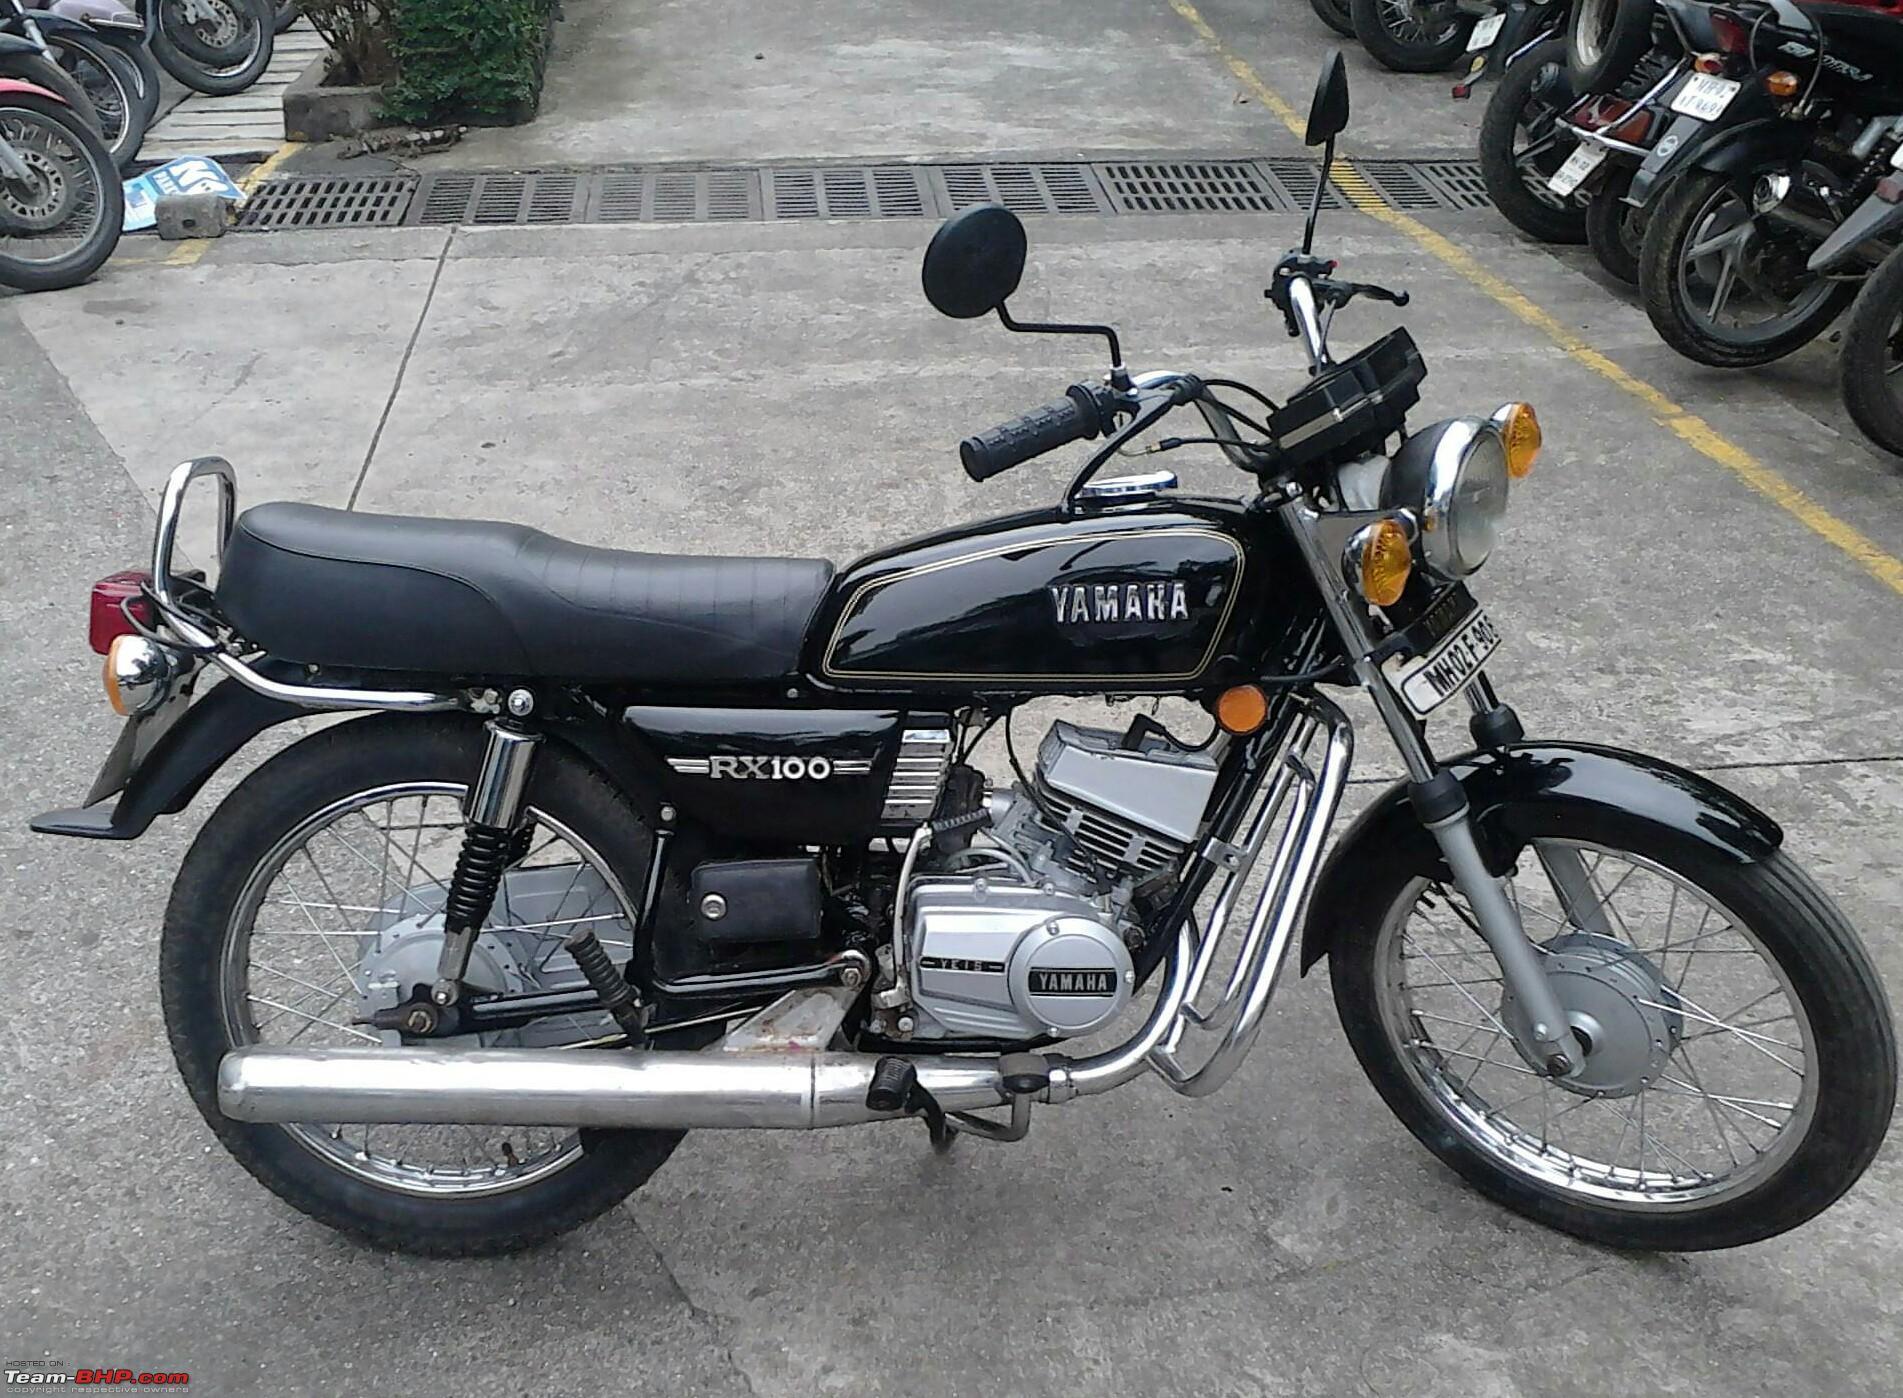 Used  Yamaha Rx Suspension